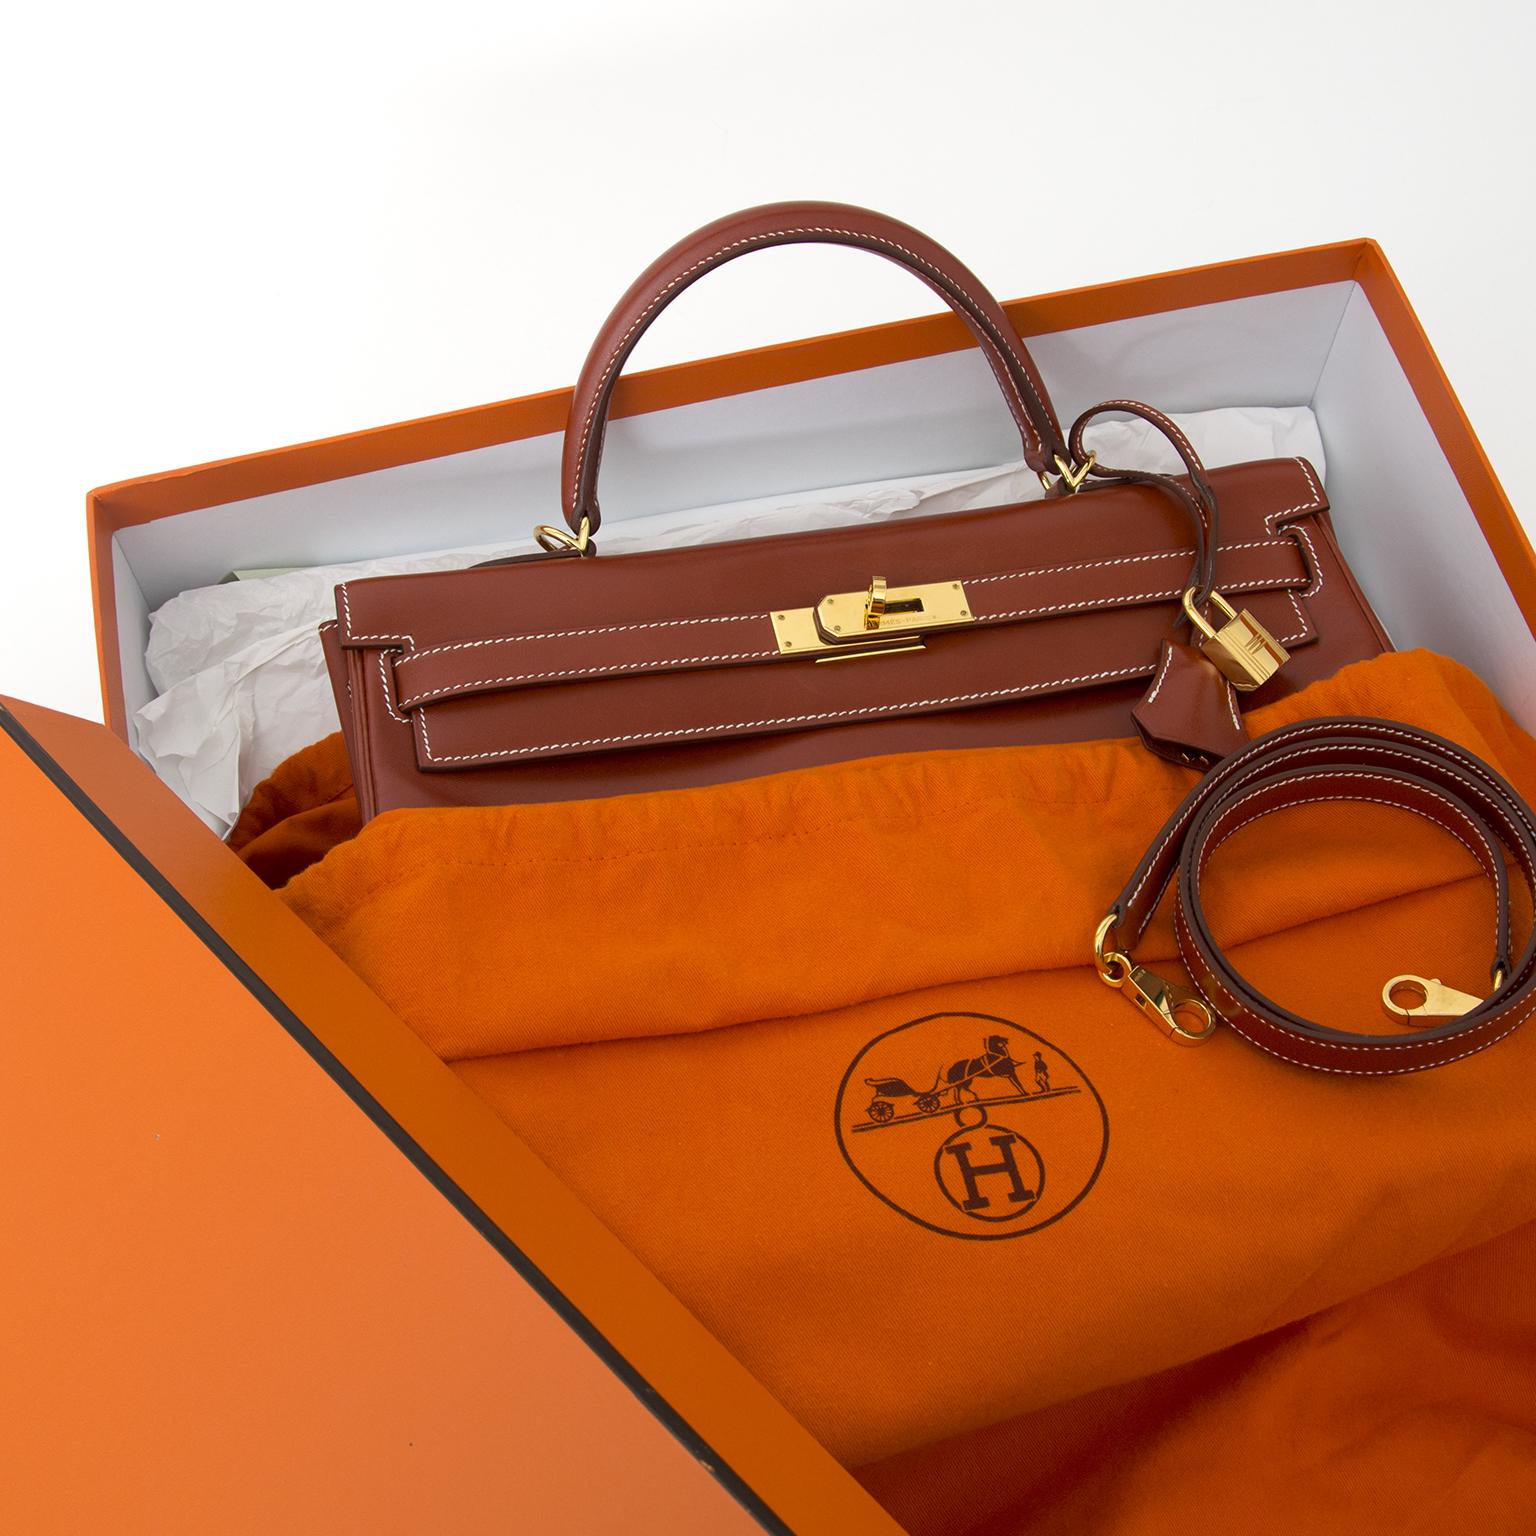 Hermes Black 32cm Box Calf Kelly Sellier Bag, GHW